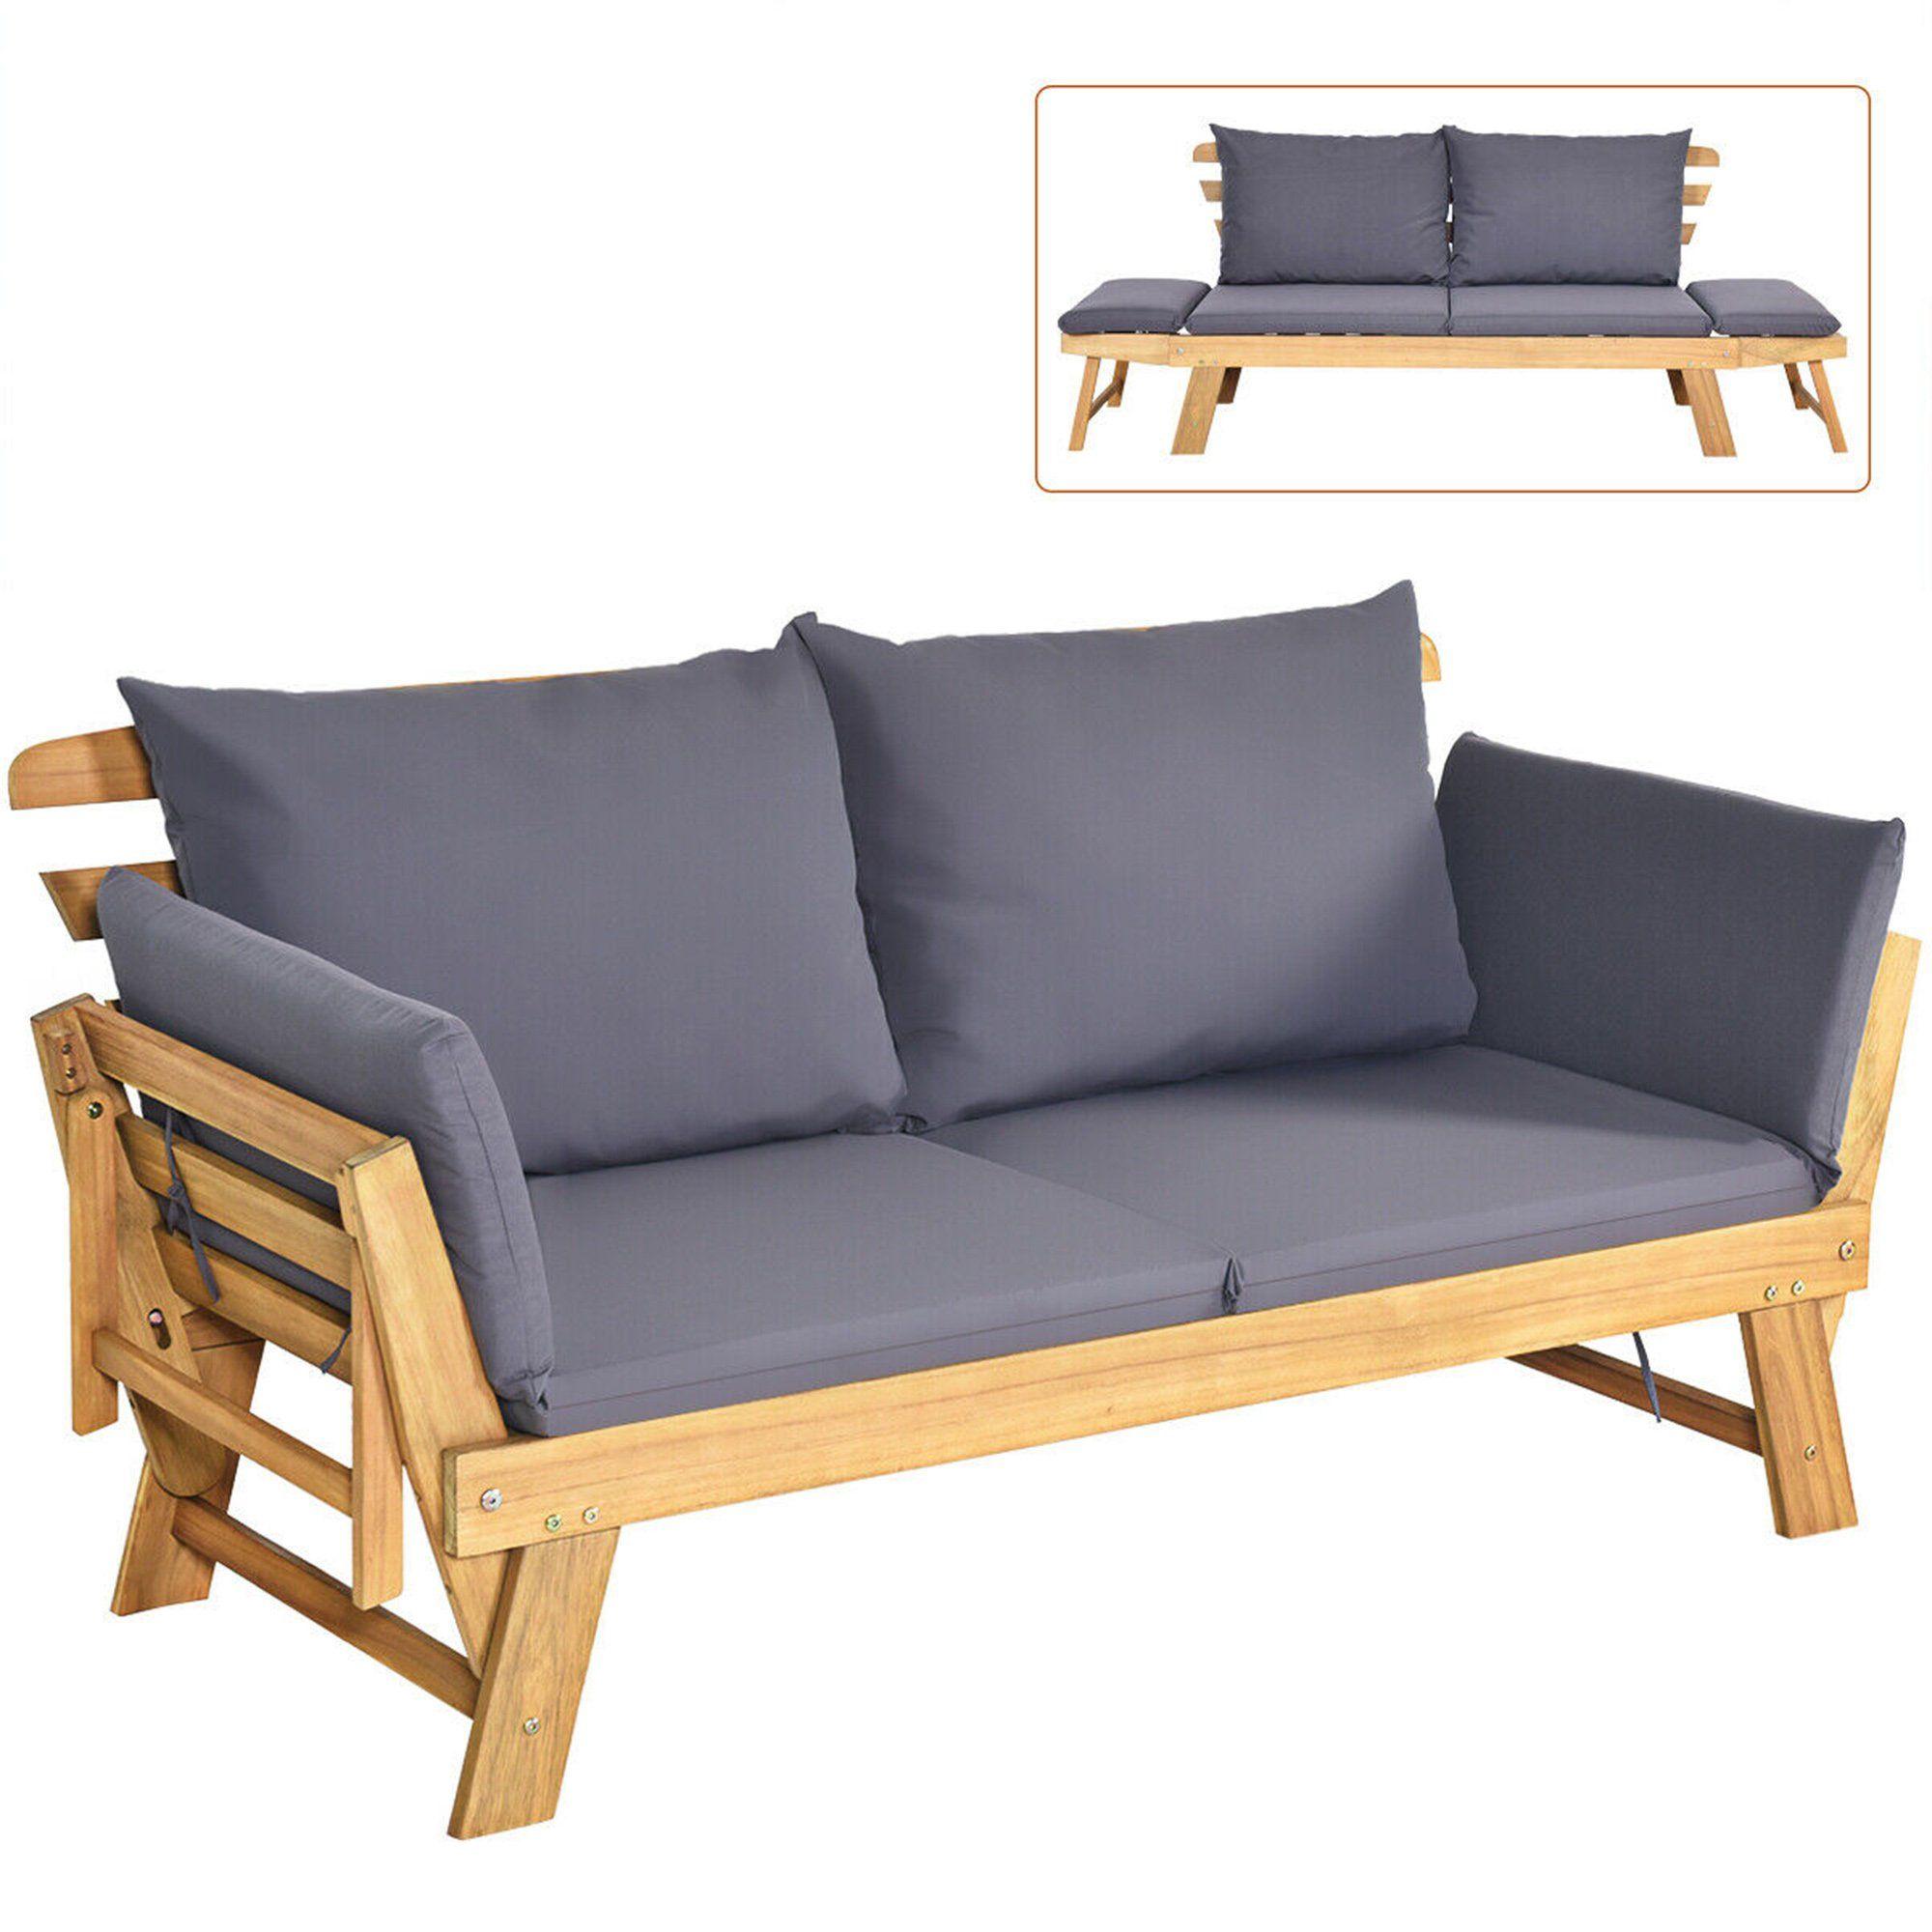 gymax adjustable patio sofa daybed